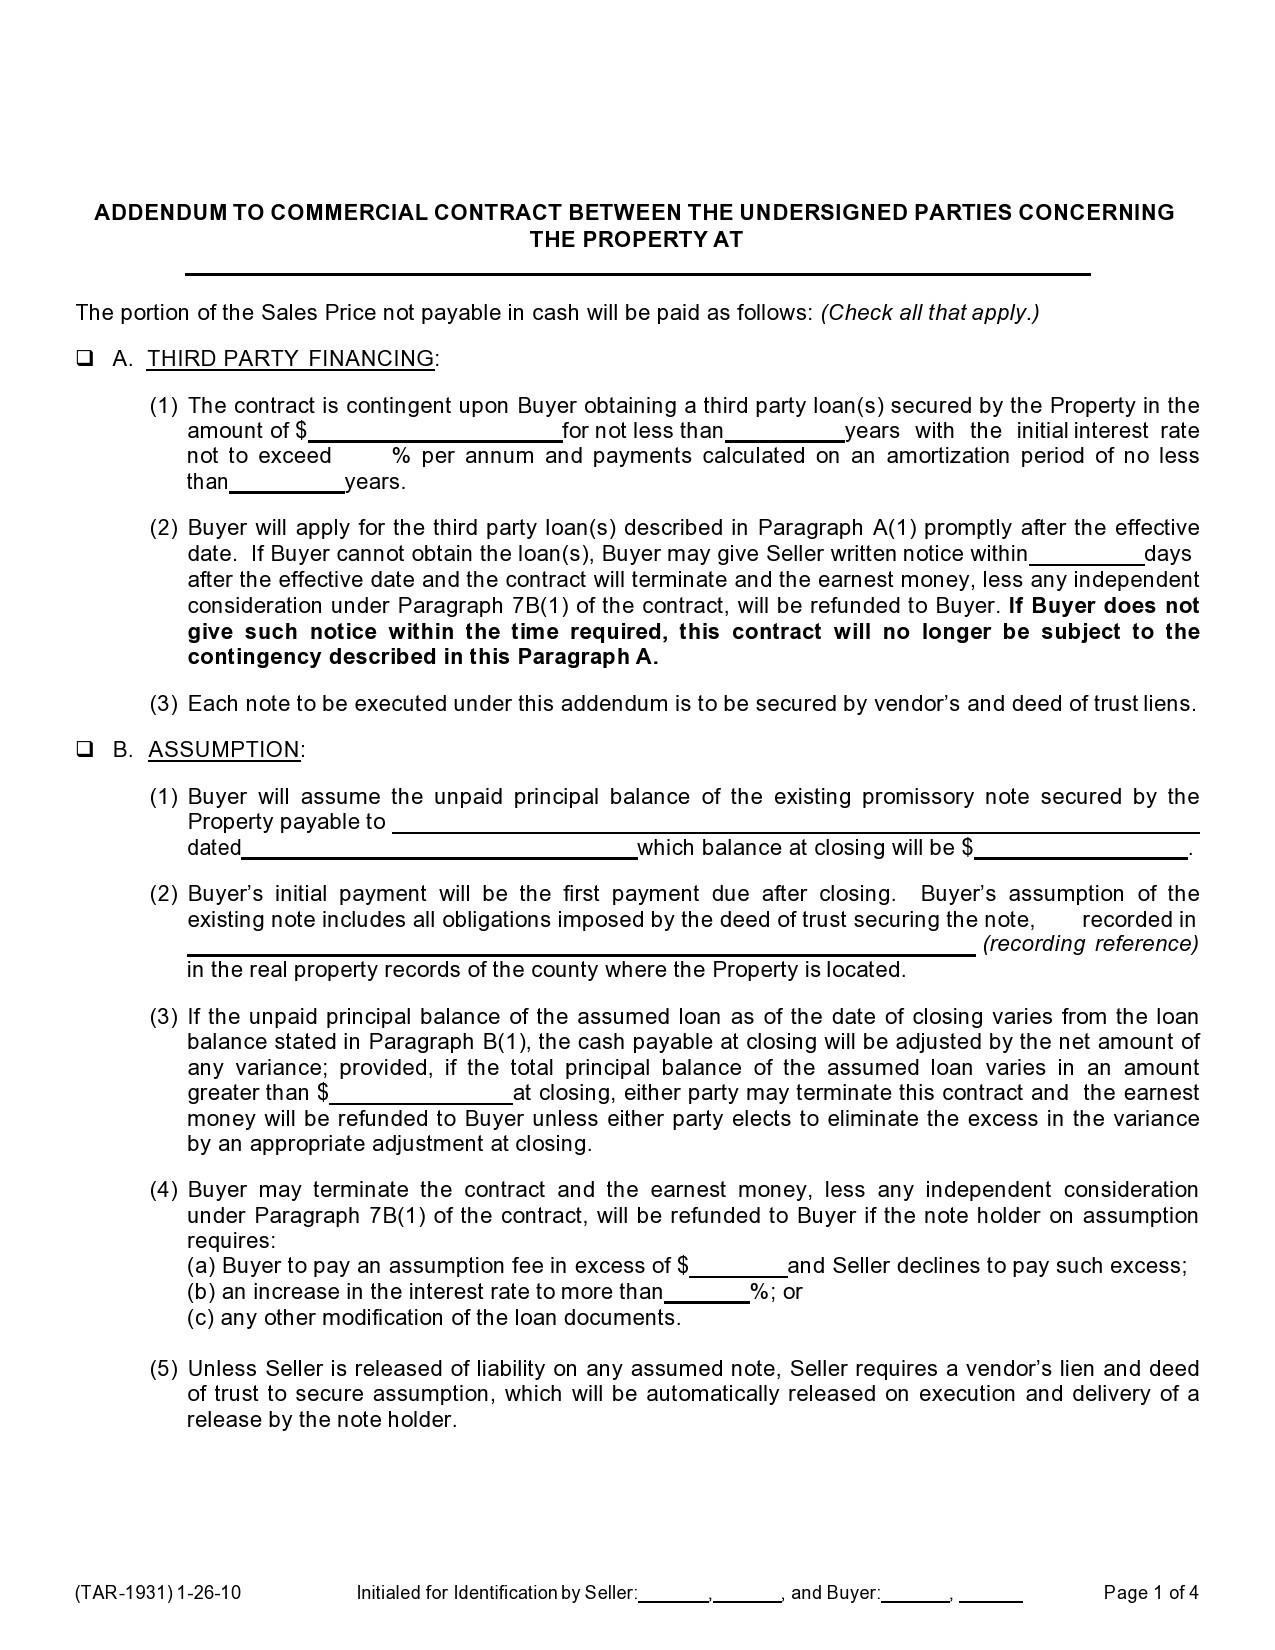 Free seller financing addendum 12